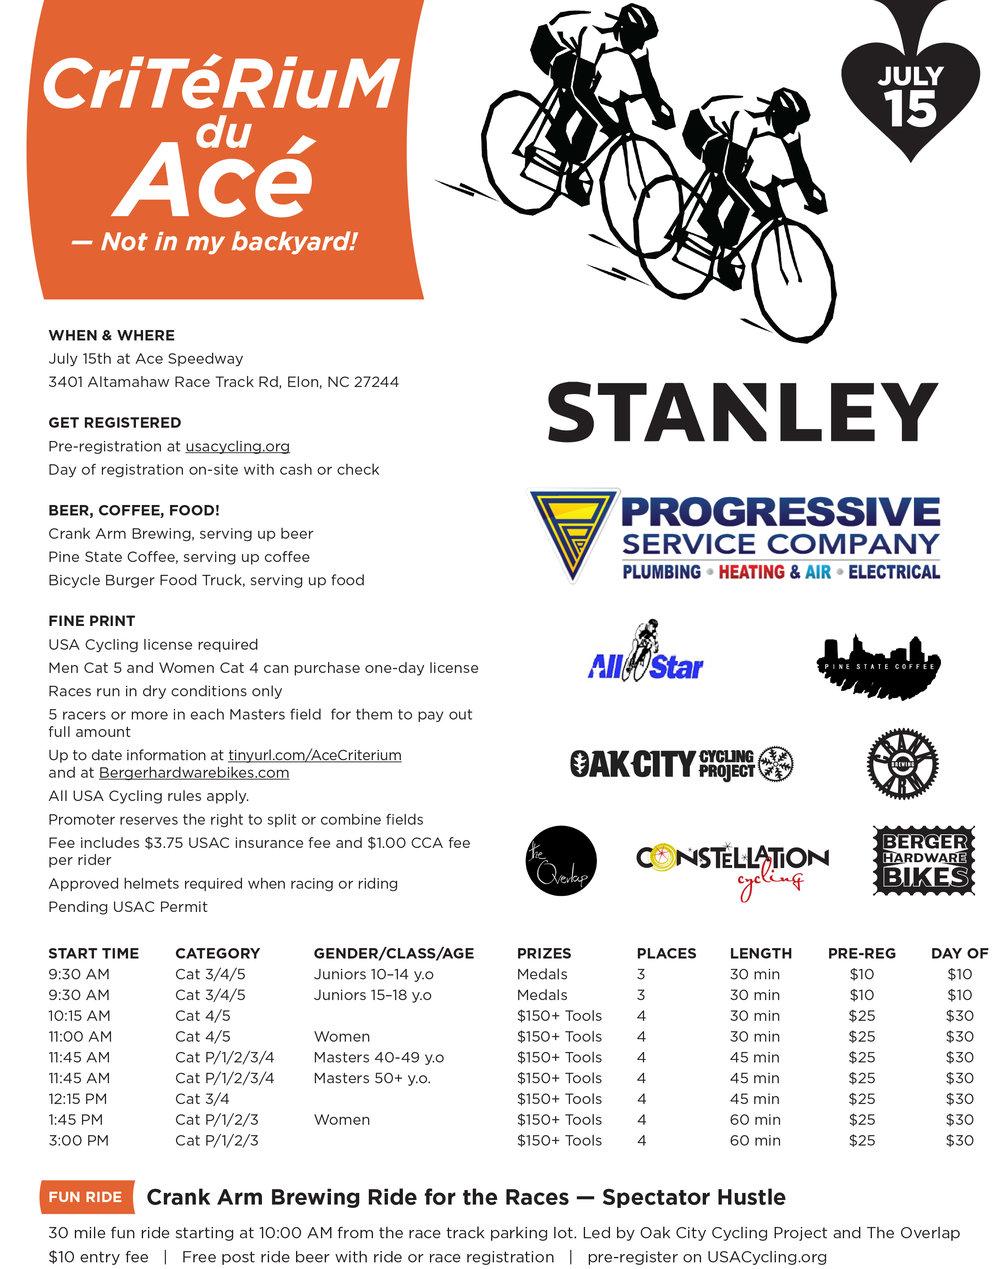 stanley tools criterium du ace u2014 berger hardware bikes